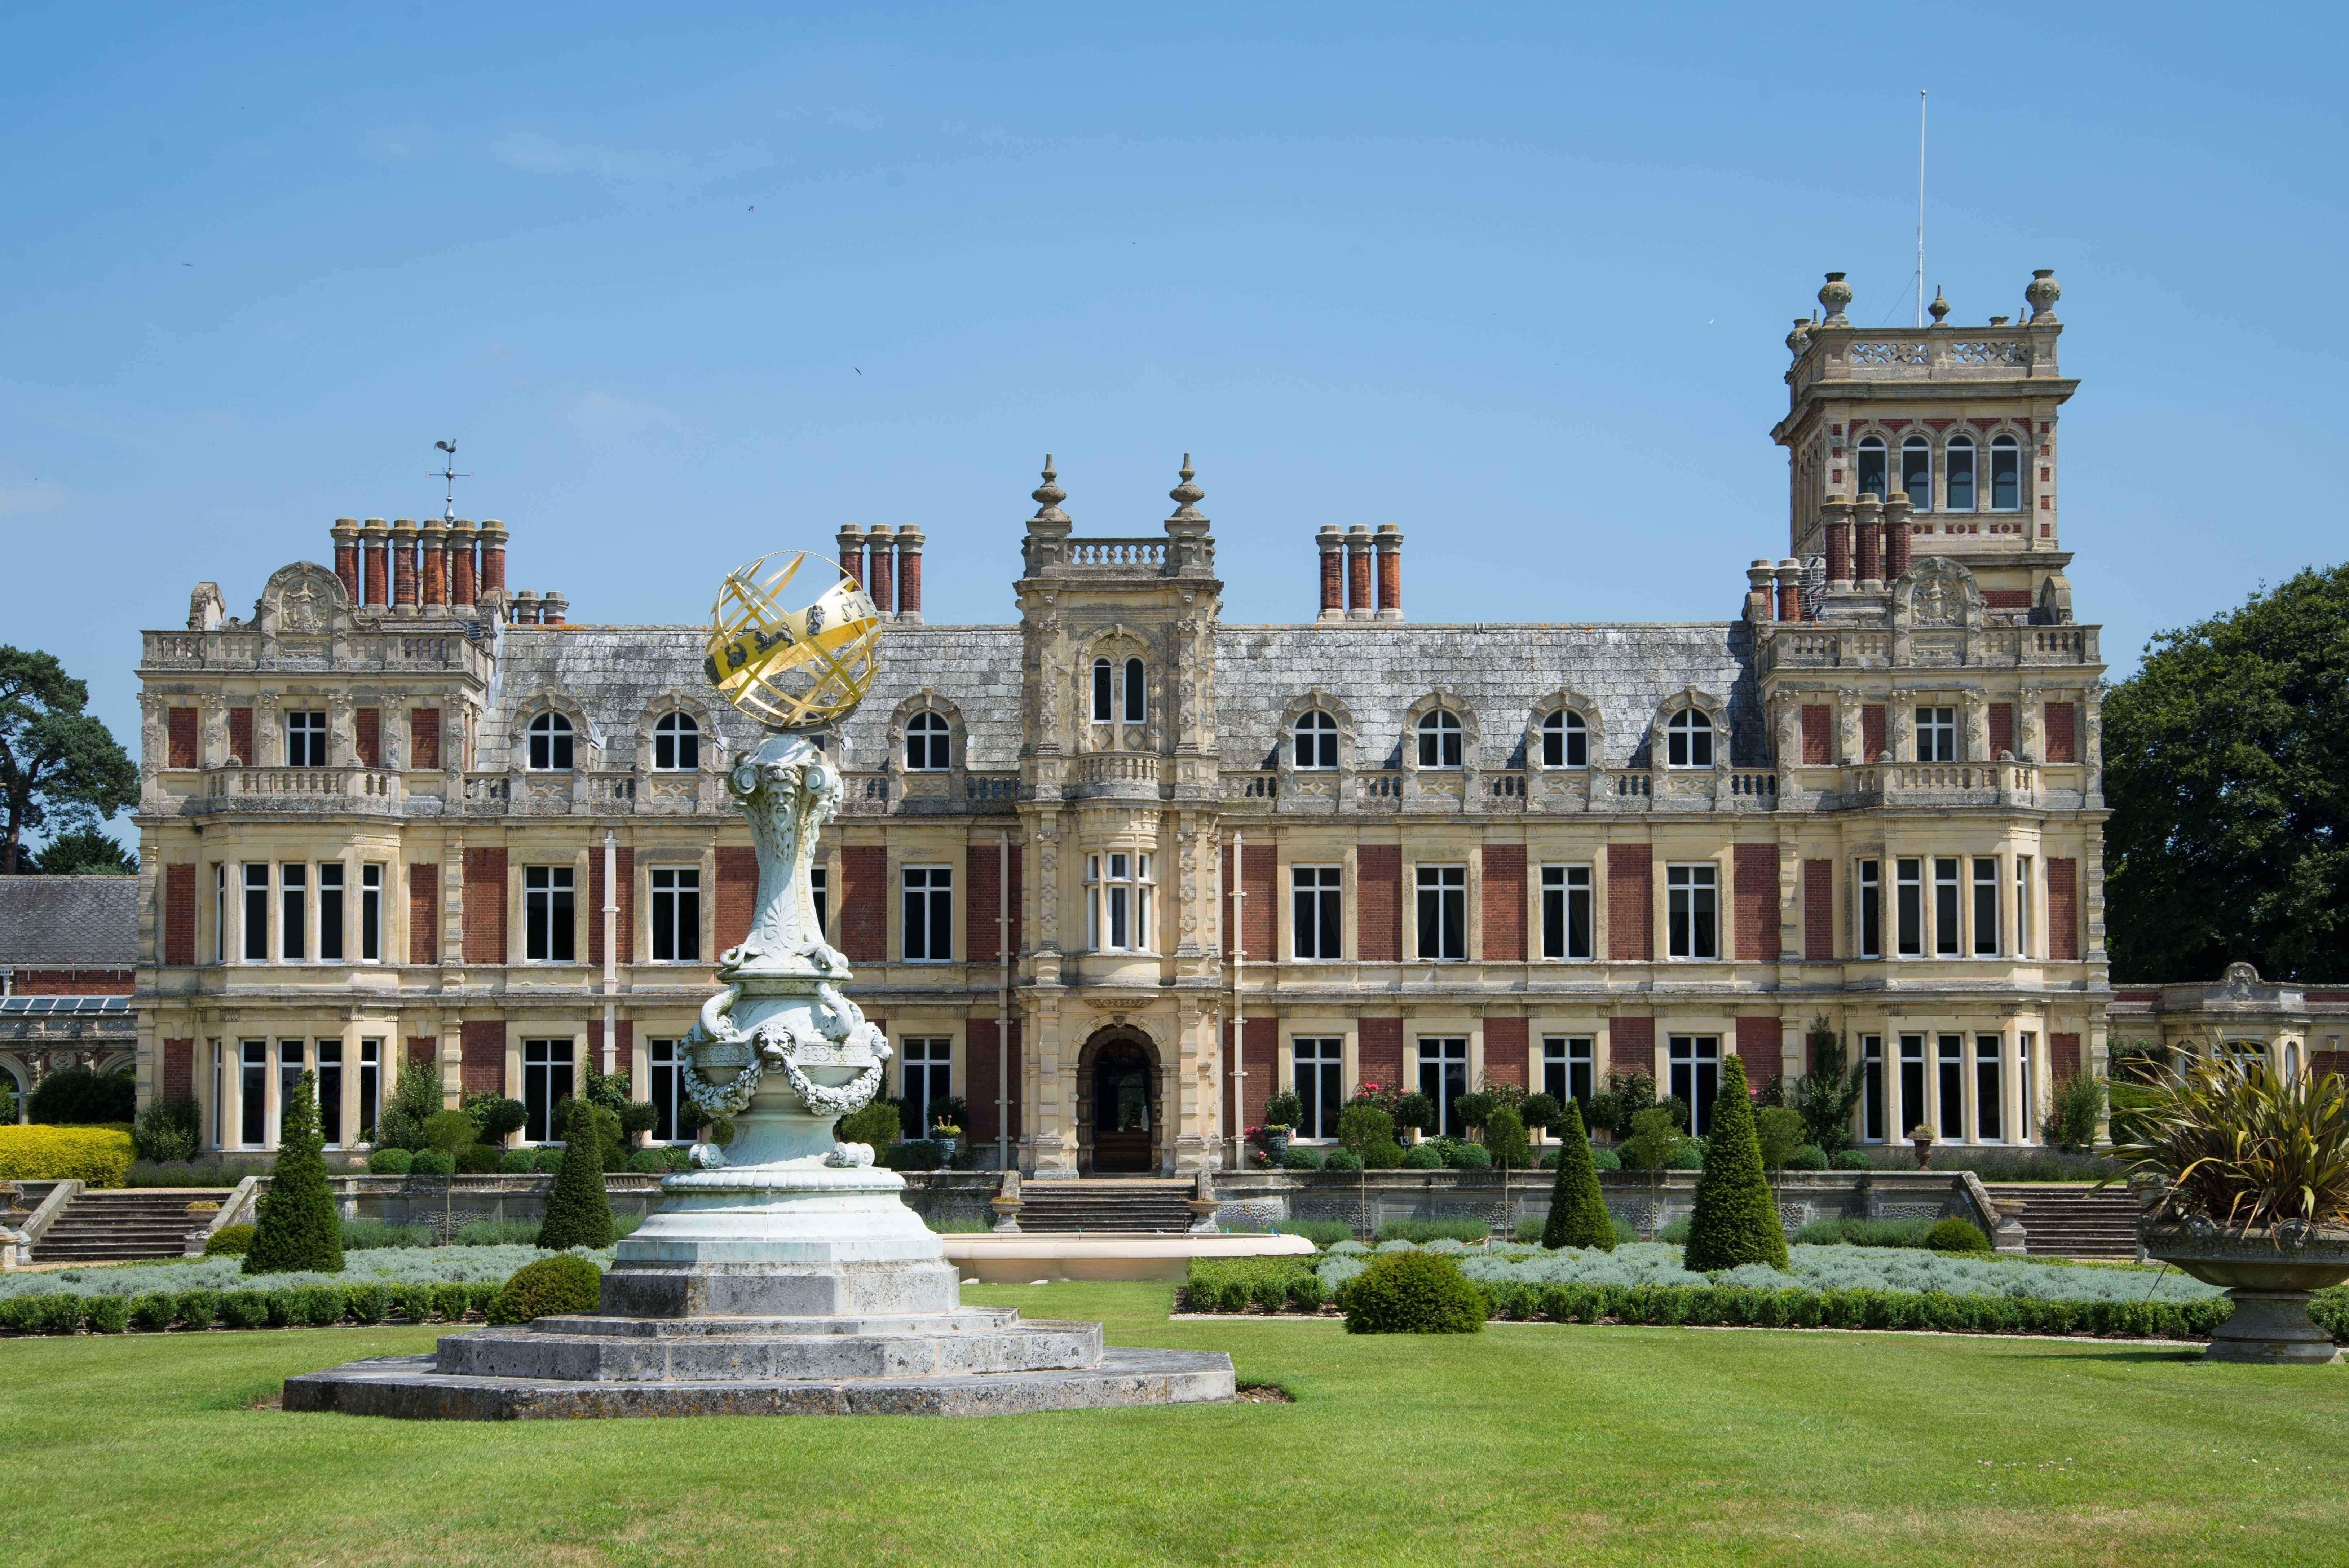 Somerleyton Hall, Suffolk, England